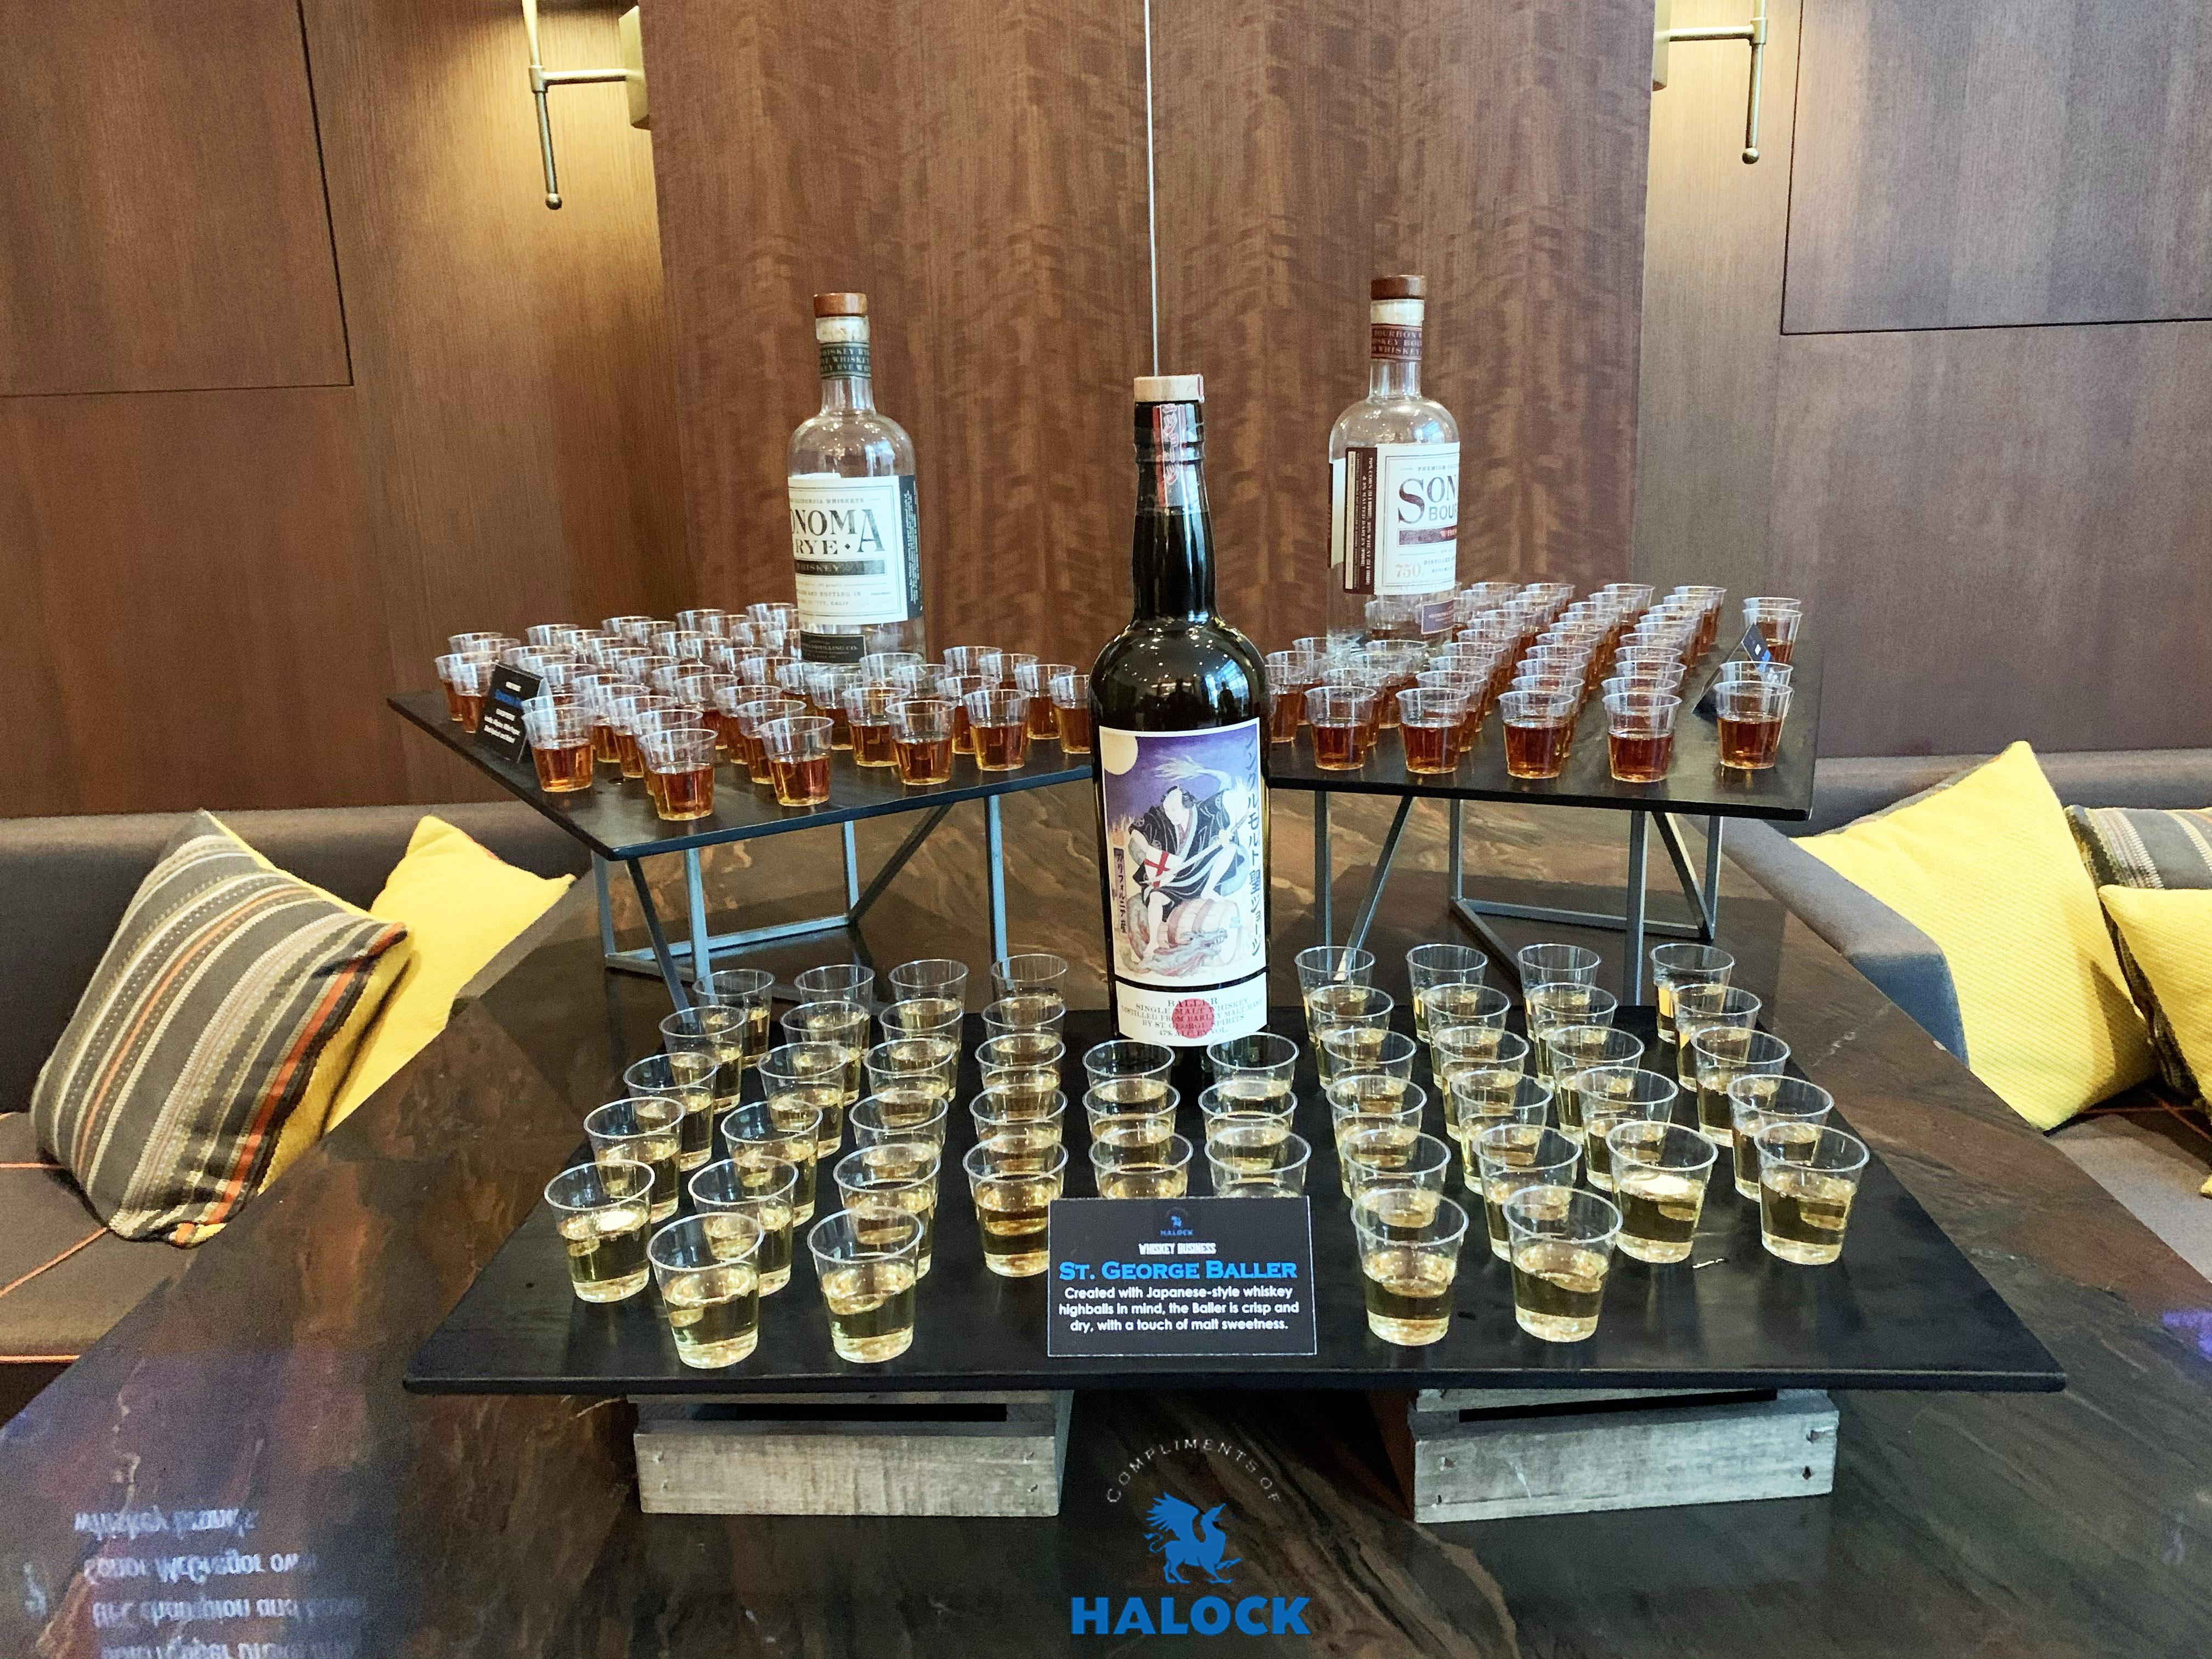 HALOCK Whiskey Business at RSA